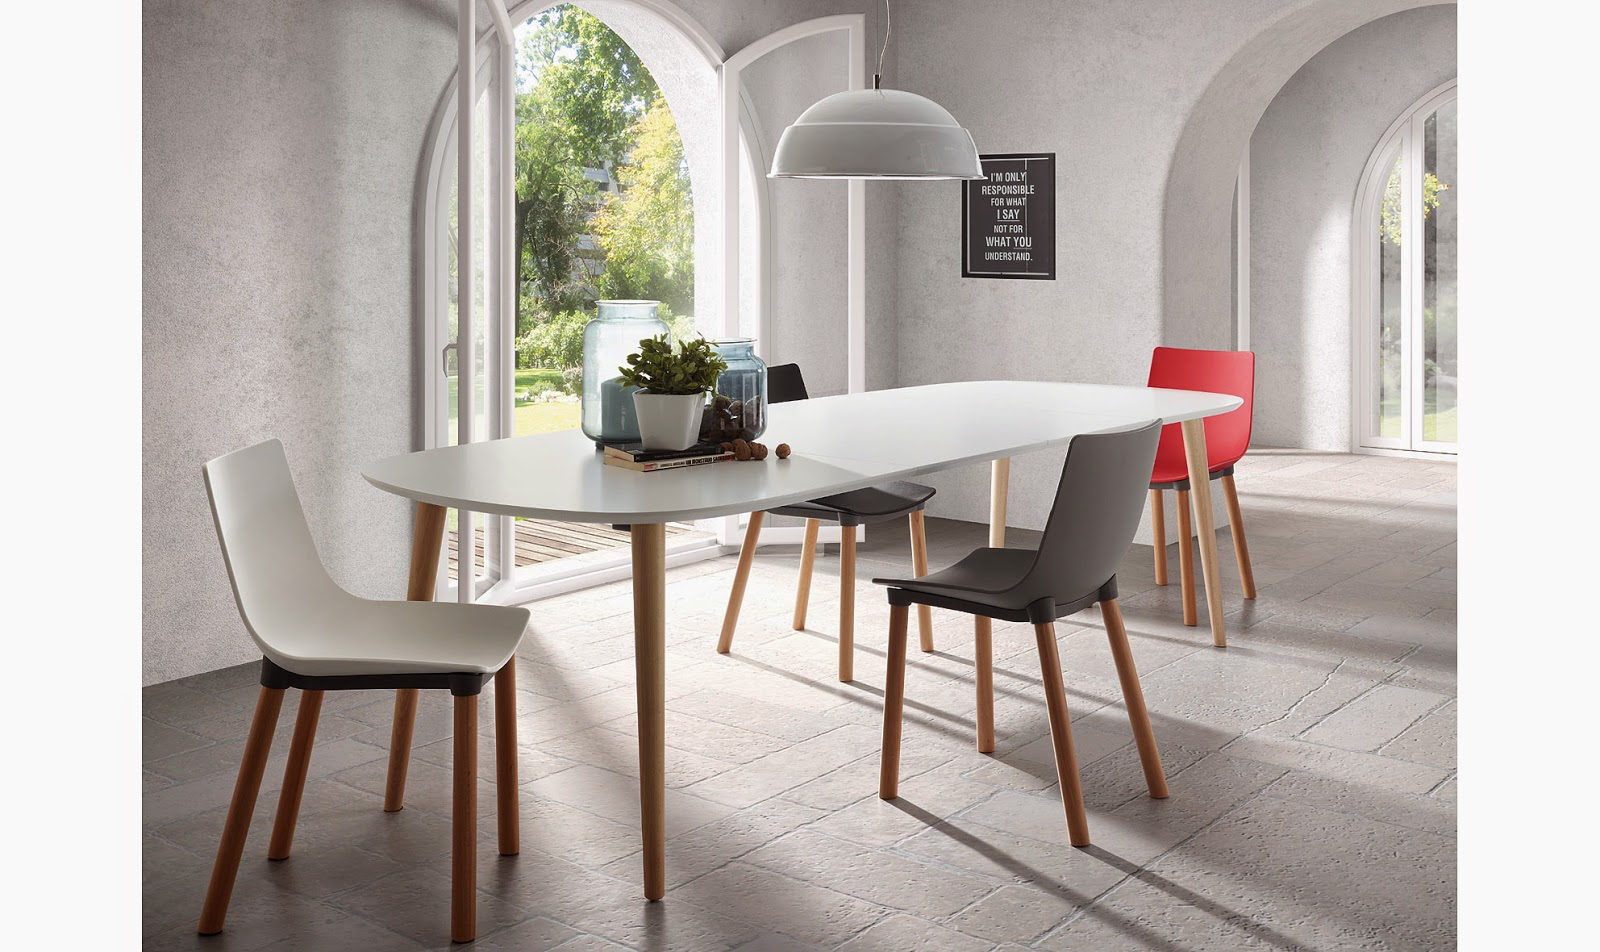 http://www.portobellostreet.es/mueble/40815/Mesa-de-comedor-blanca-Moderna-Oqui